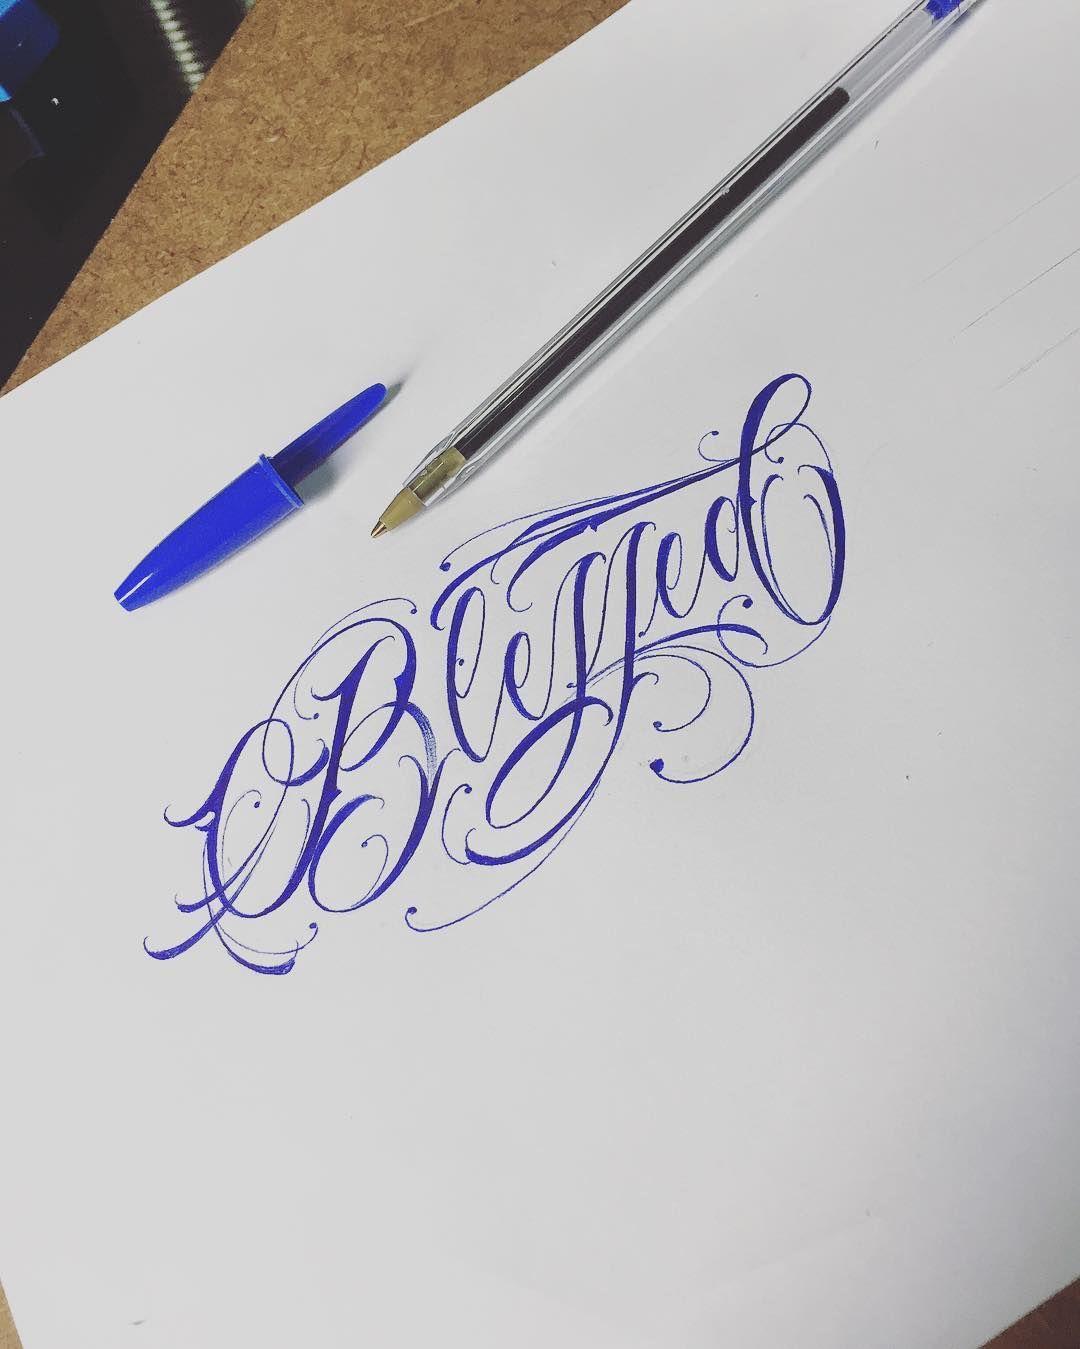 Andretattoo On Instagram Blessed Blessed Abencoados Bless Abencoado Semanaabencoad Com Imagens Tatuagem Blessed Decalque Tatuagem Letras Para Tatuagem